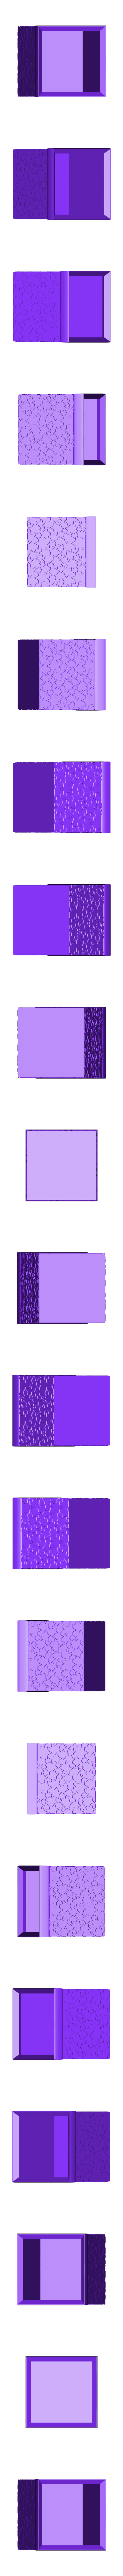 GiftBox_medium_star_bottom.STL Download free STL file Gift Box - Medium • 3D printer model, DDDeco